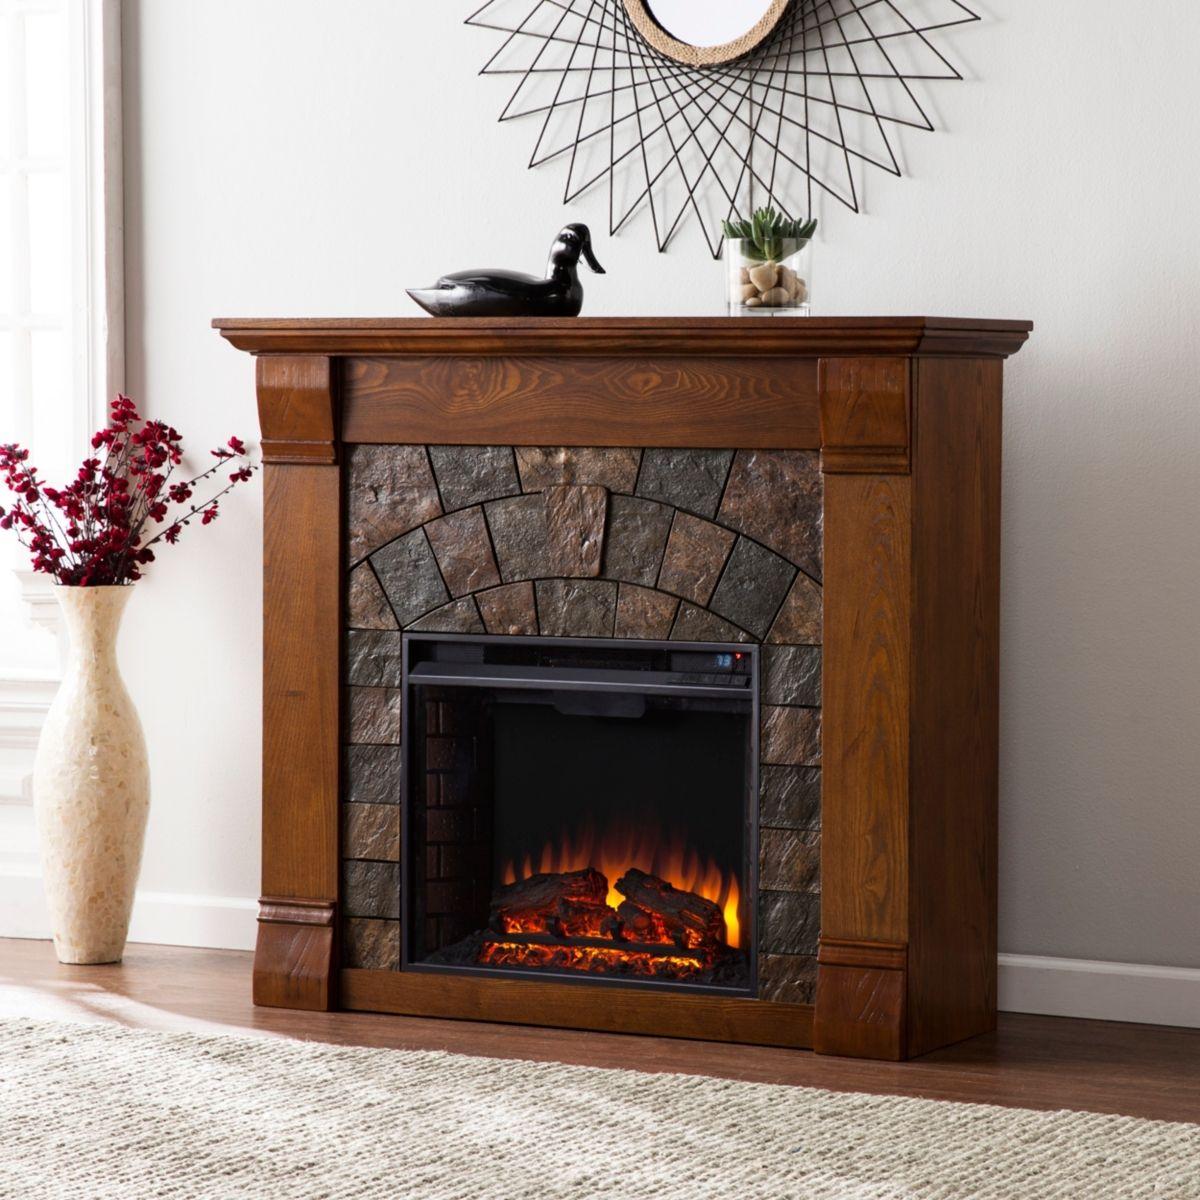 Southern Enterprises Shoreham El Fireplace Reviews Furniture